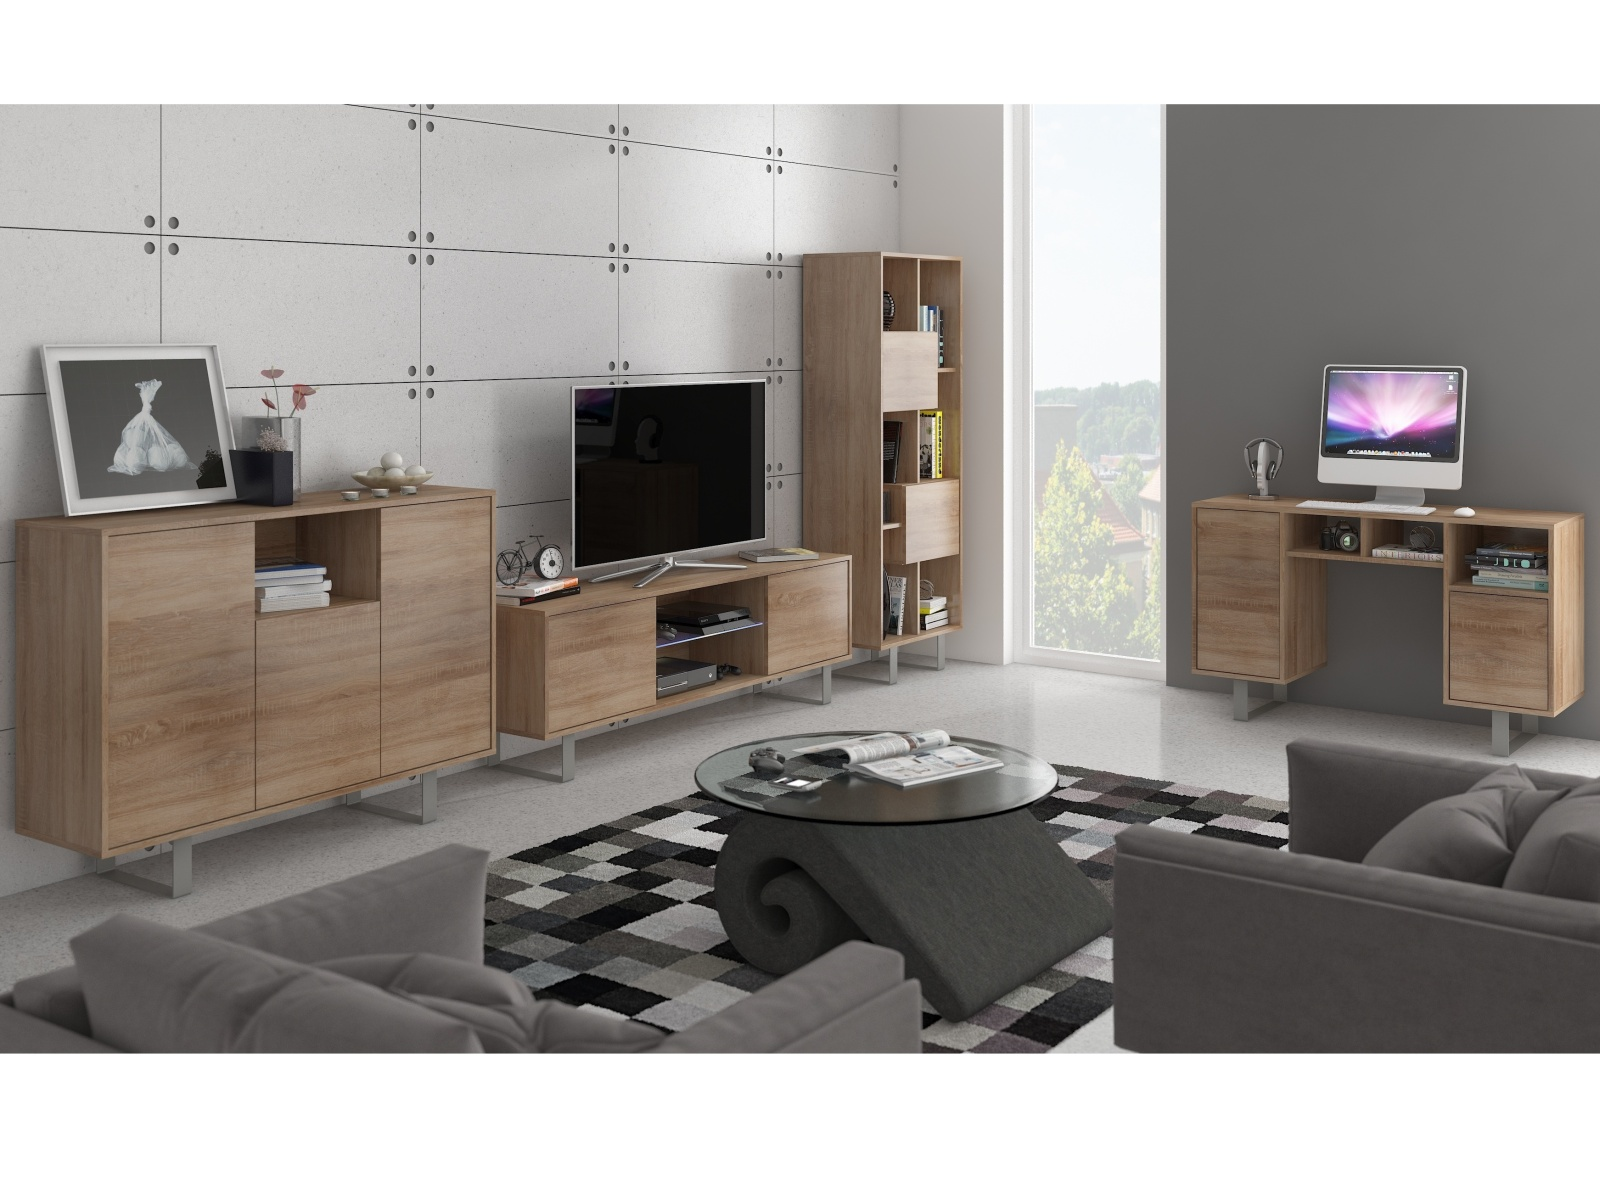 MORAVIA FLAT KING obývací pokoj - sestava 2, dub sonoma